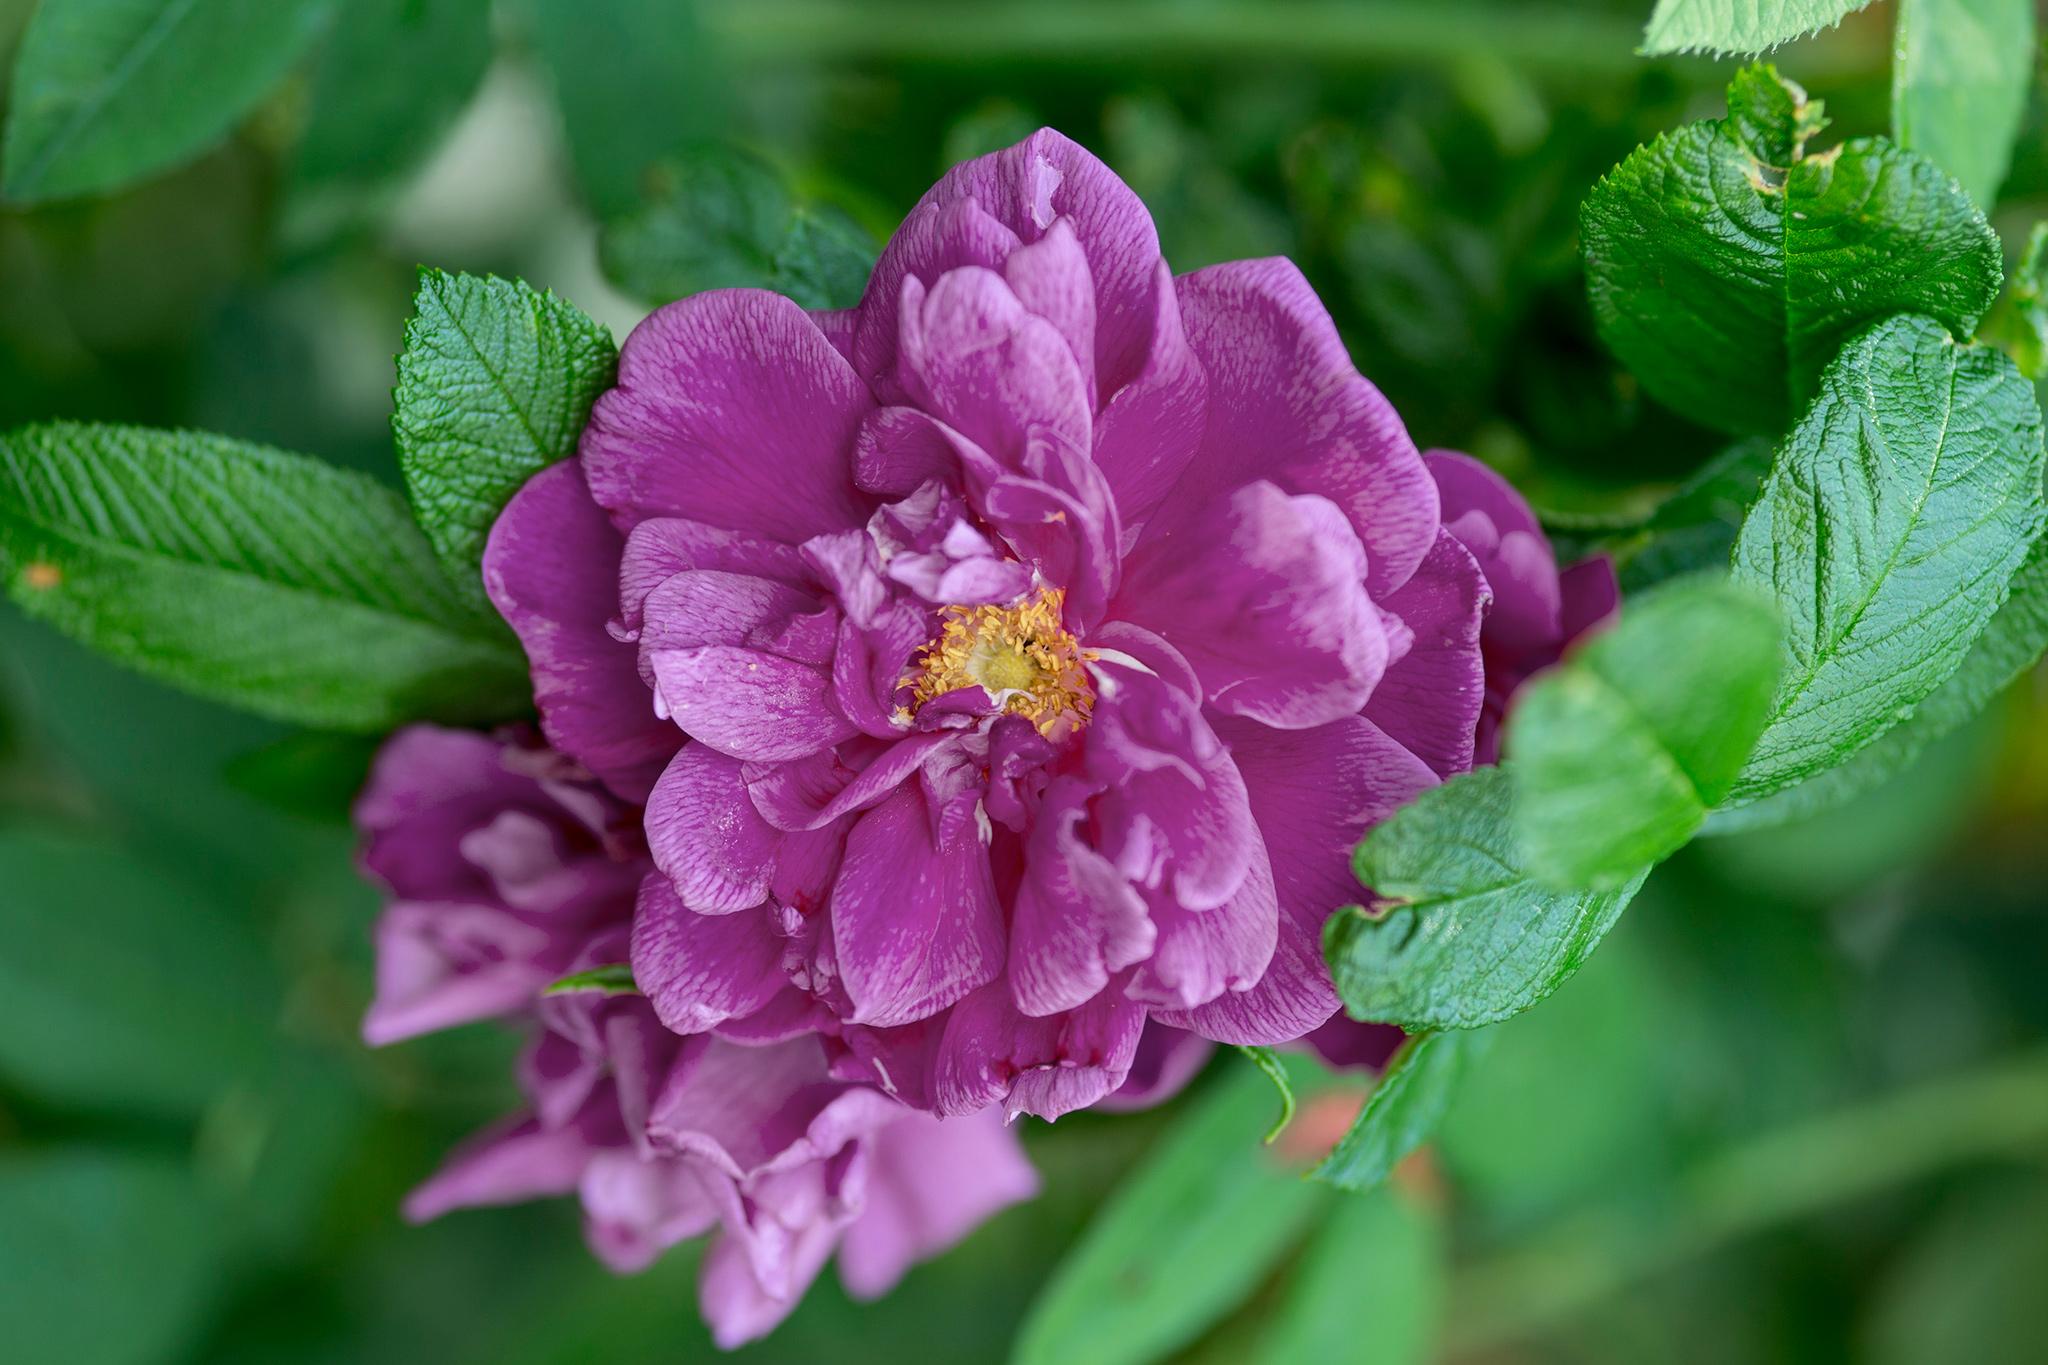 rosa-roseraie-de-lhay-2